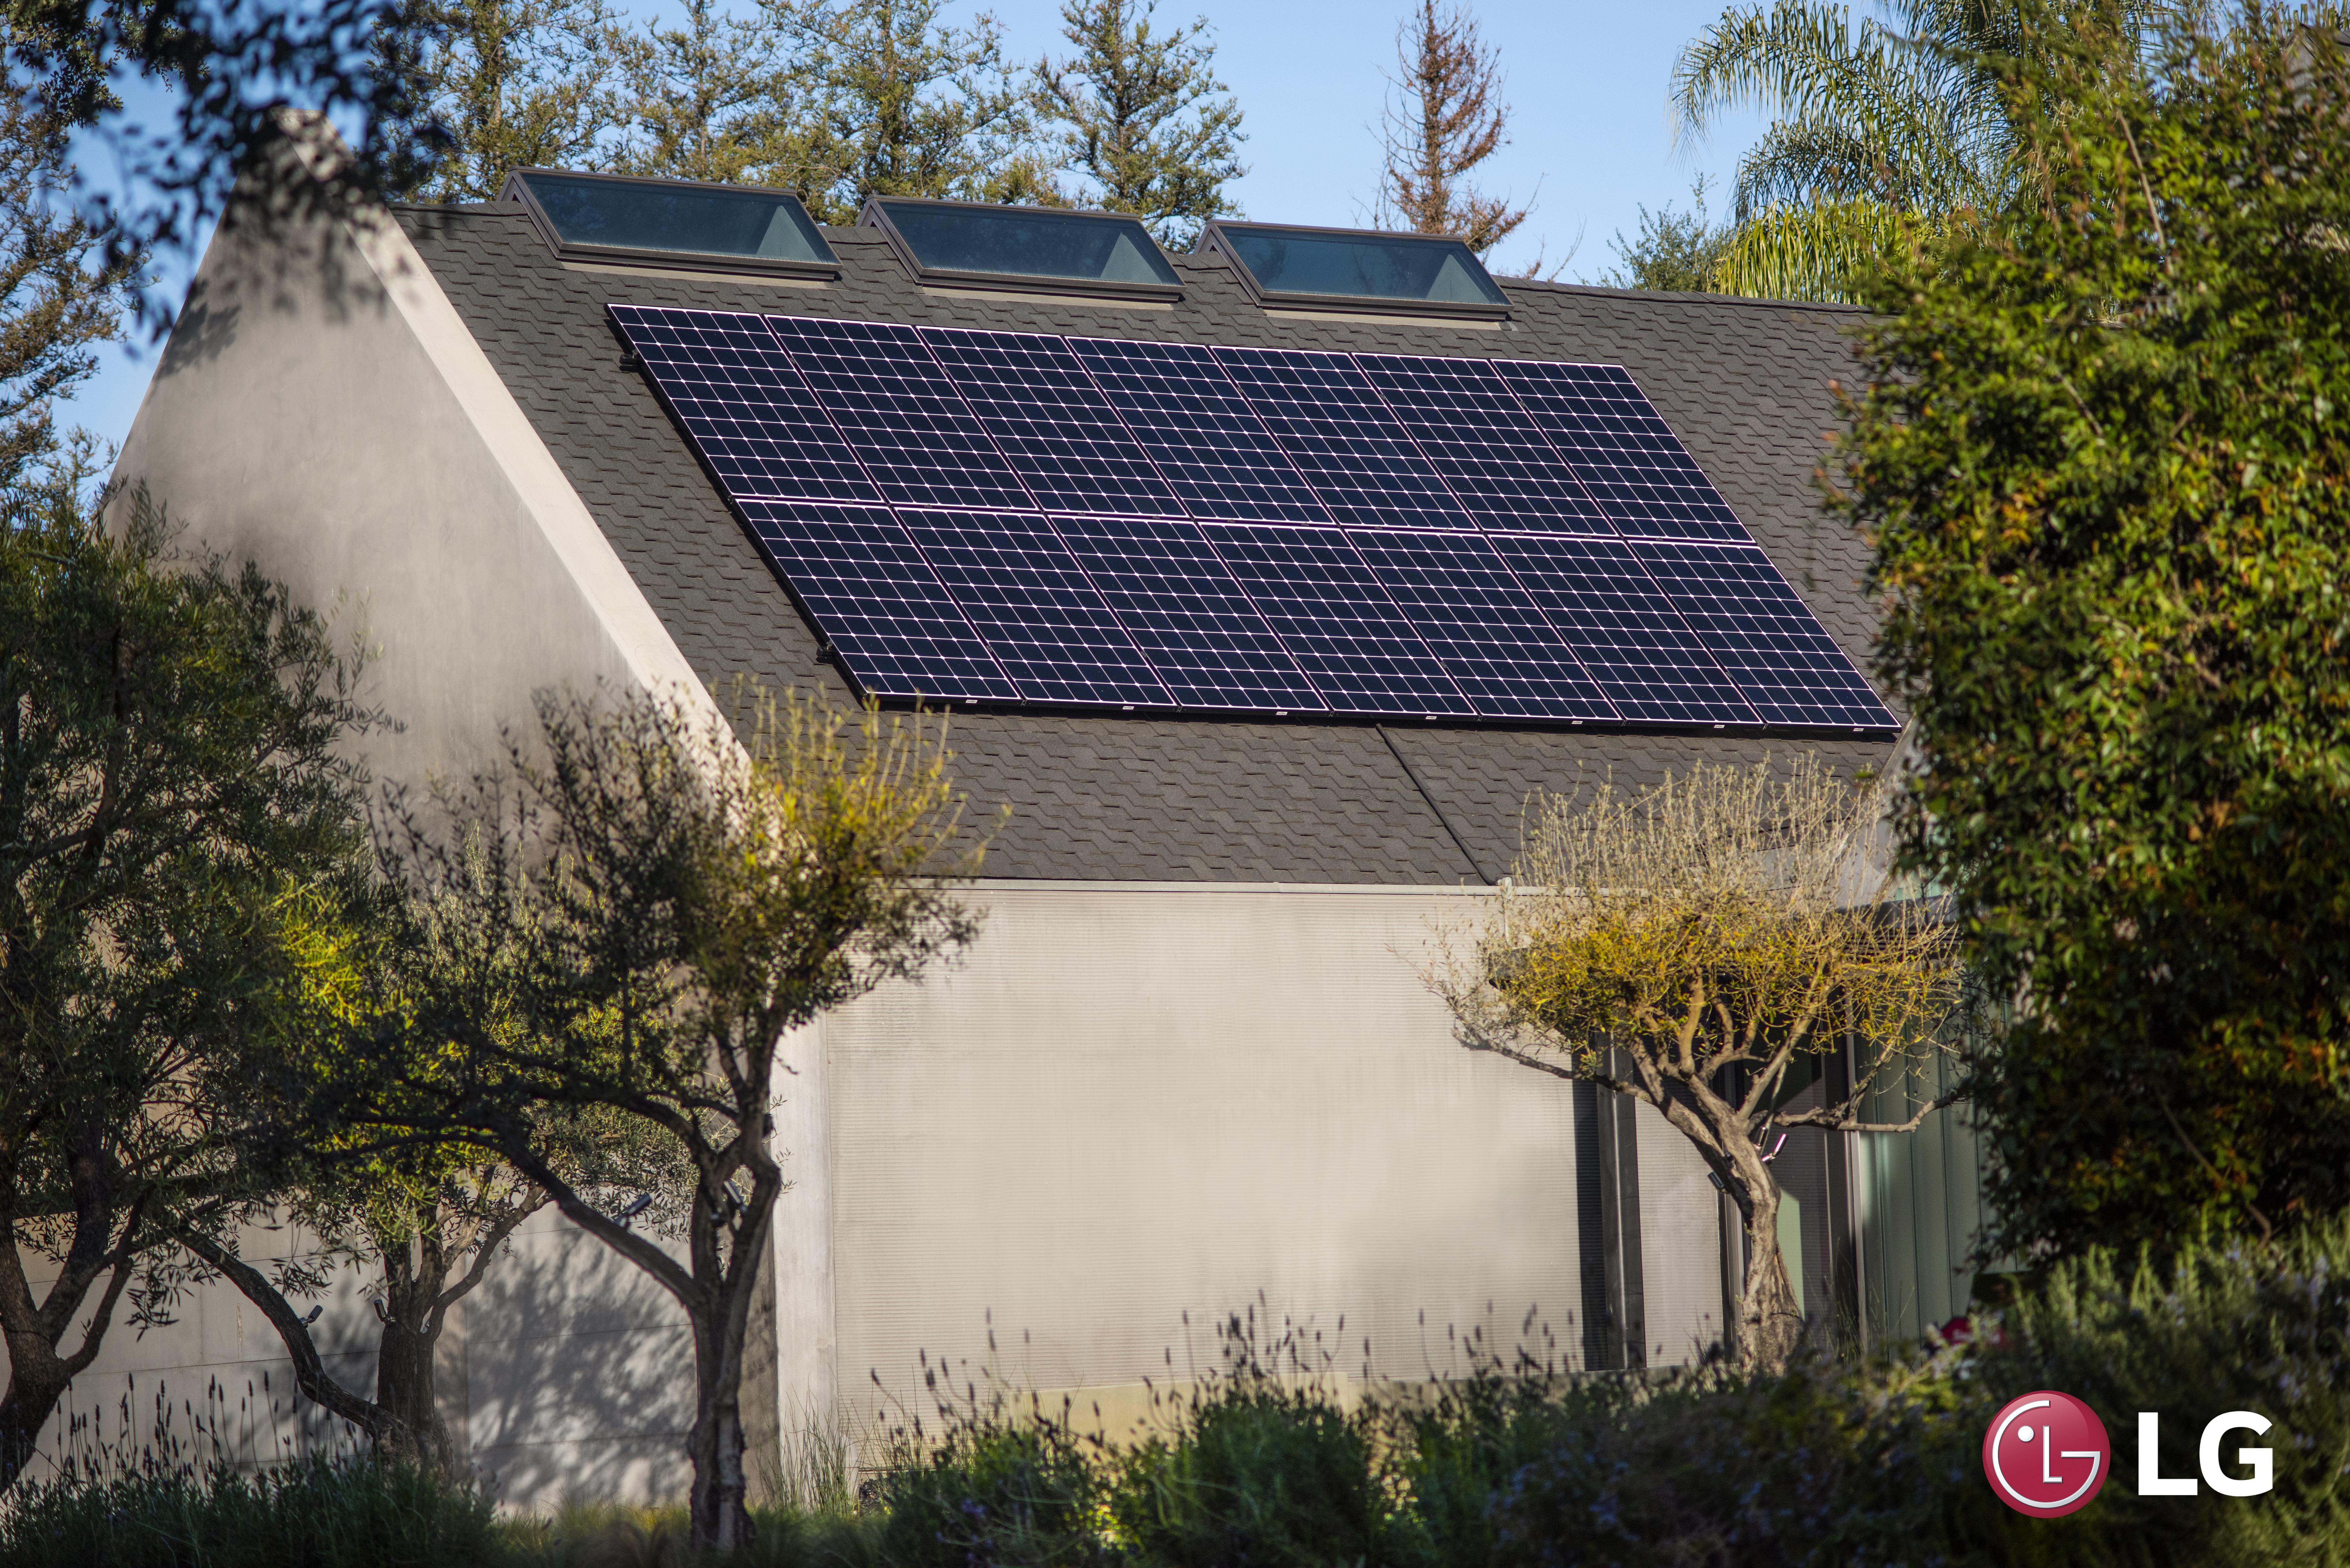 LG Solar Panel Home